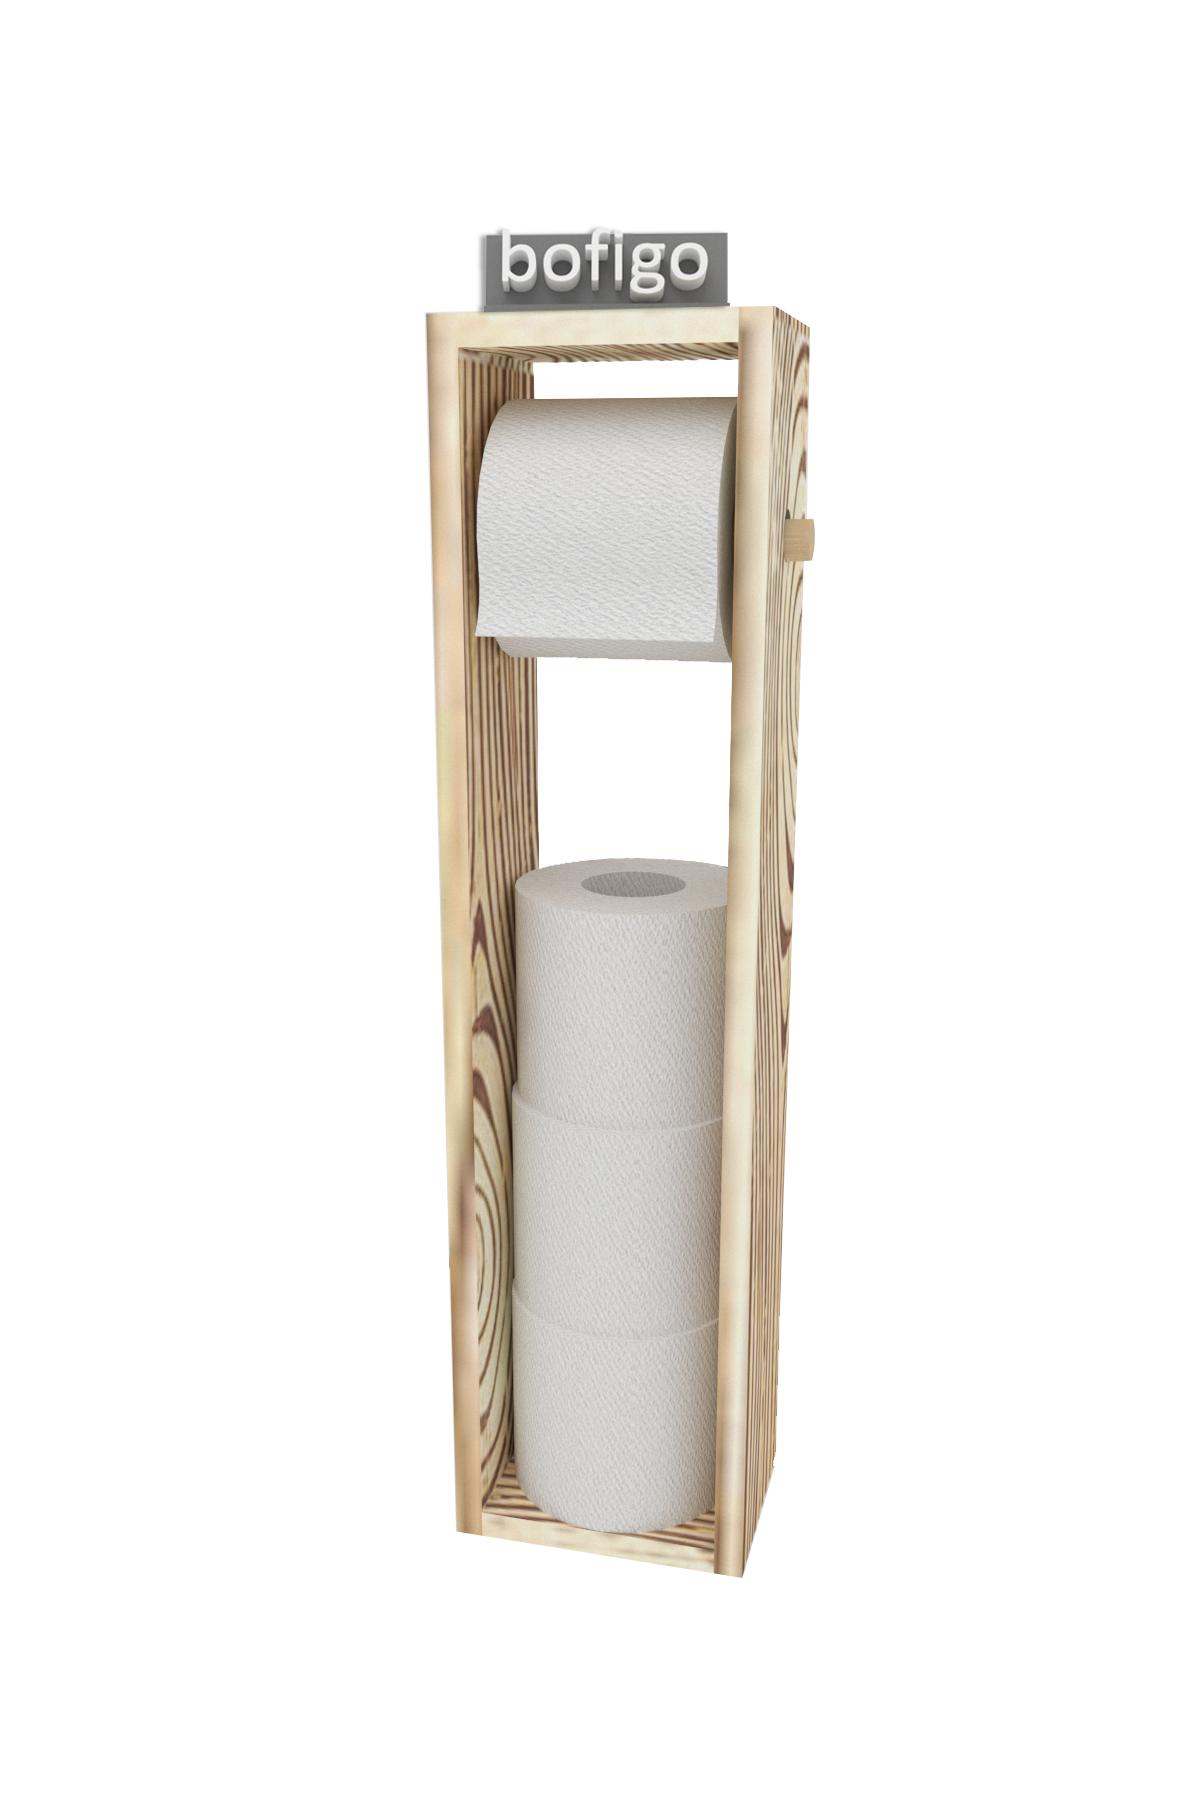 Bofigo Toilet Paper Holder WC Paper Holder Wooden Toilet Paper Holder